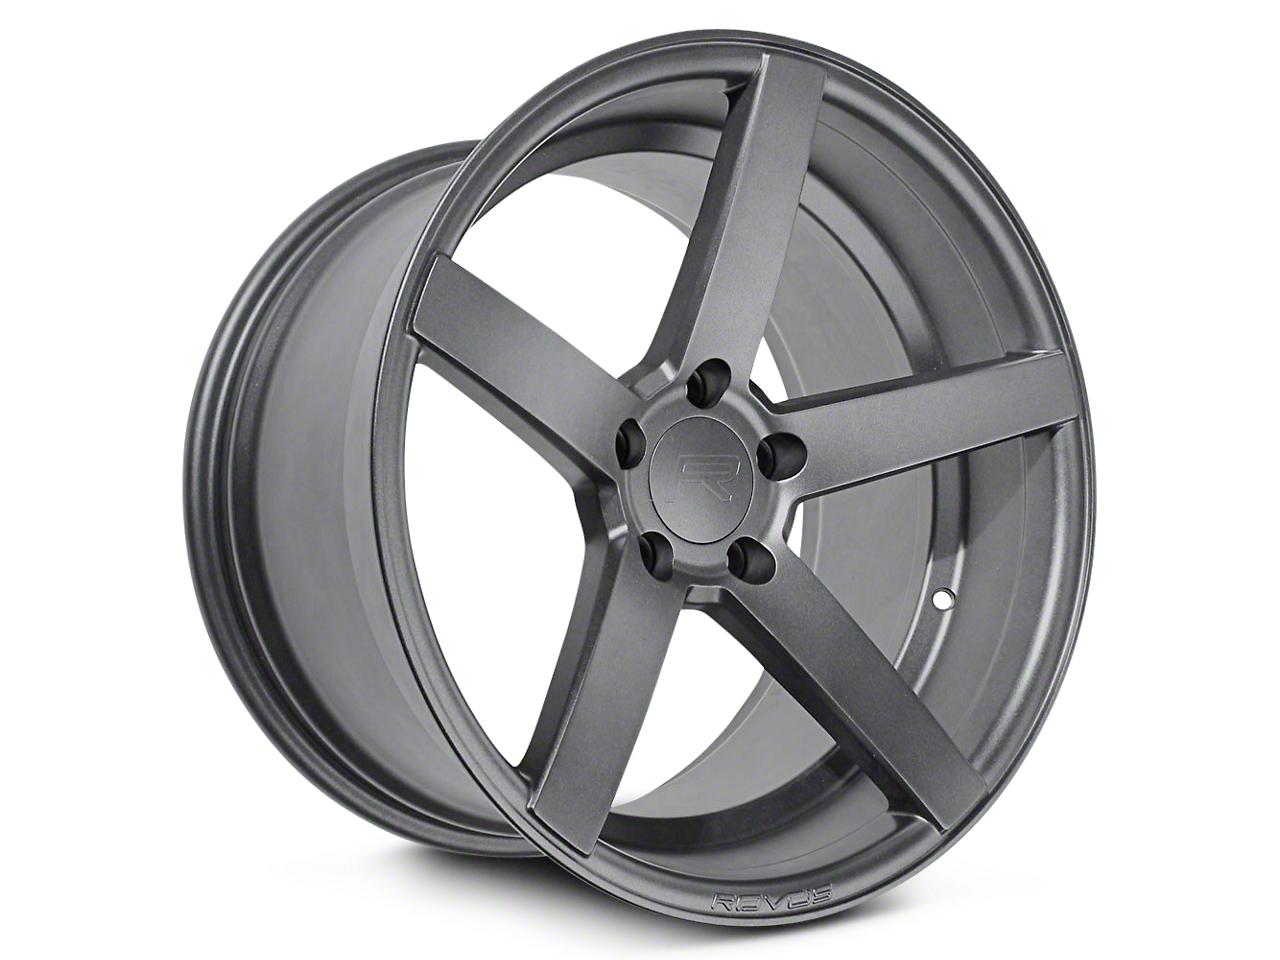 Rovos Durban Satin Gunmetal Wheel - 20x8.5 (15-18 GT, EcoBoost, V6)